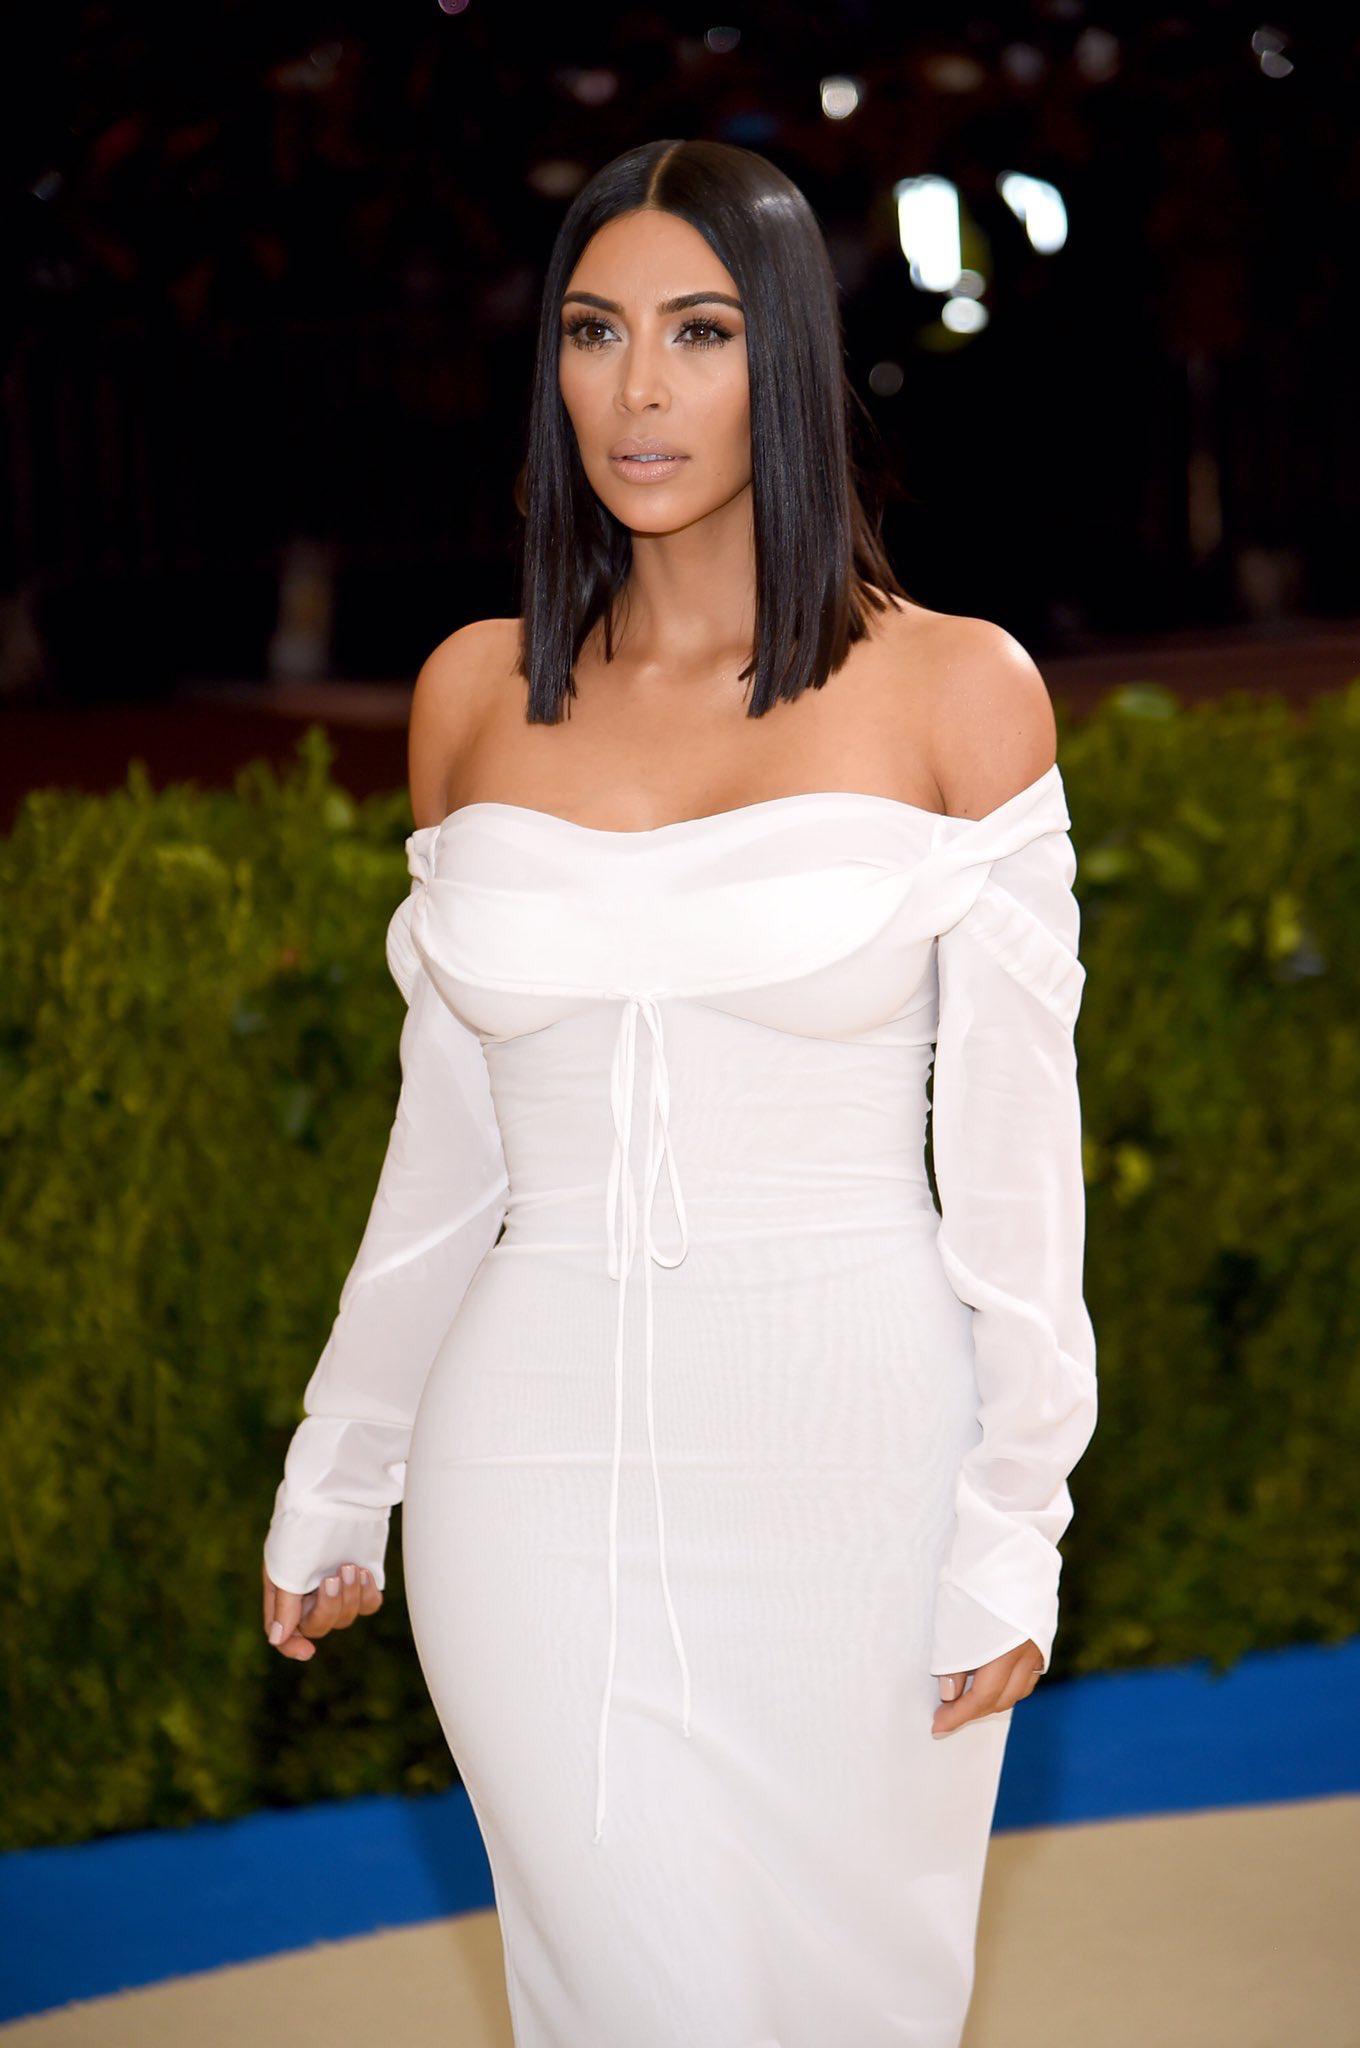 Khloe kardashian wedding dress  Pin by Kardashian Jenner on Red Carpet Style Kim Kardashian